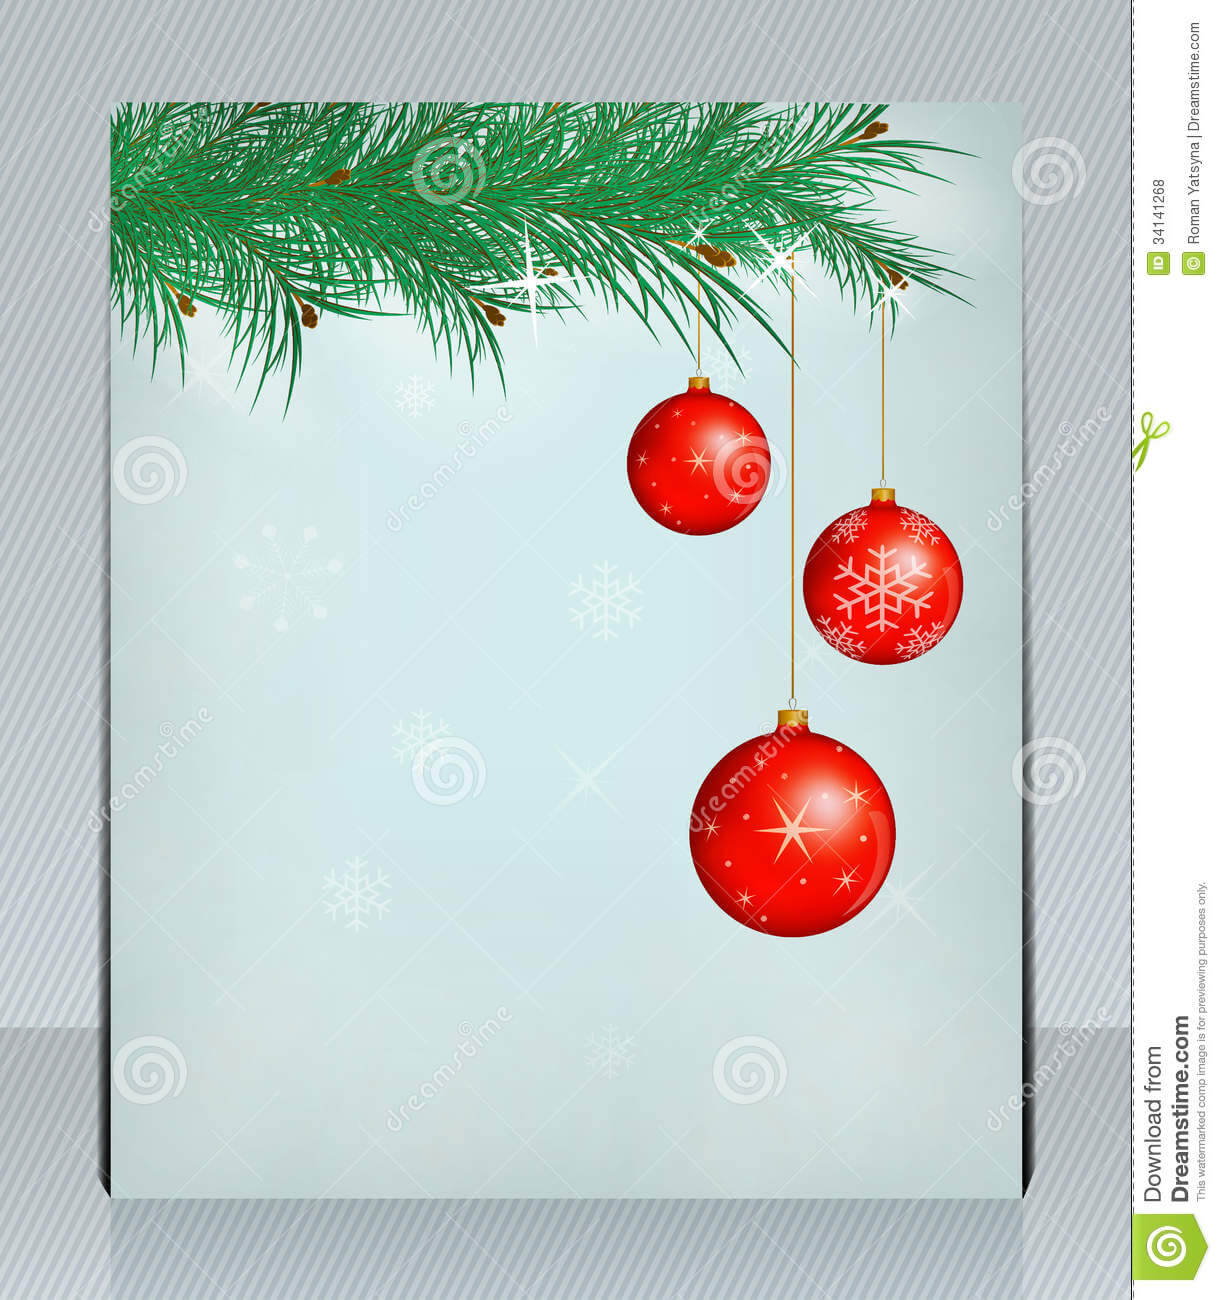 003 Free Christmas Flyer Templates Sample Brochure Template Within Christmas Brochure Templates Free